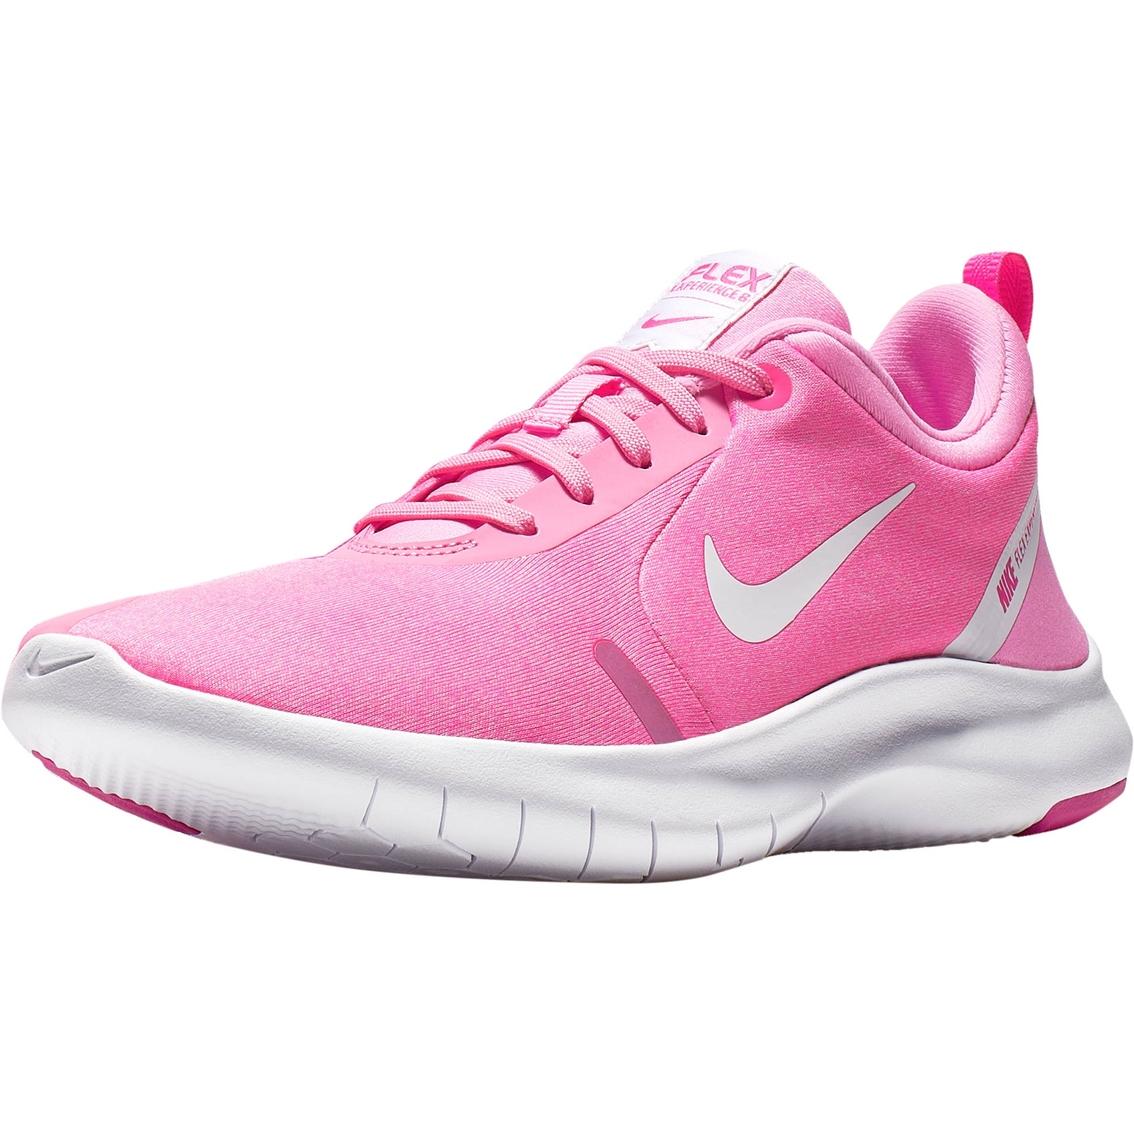 nike flex experience rn 8 women's running shoes